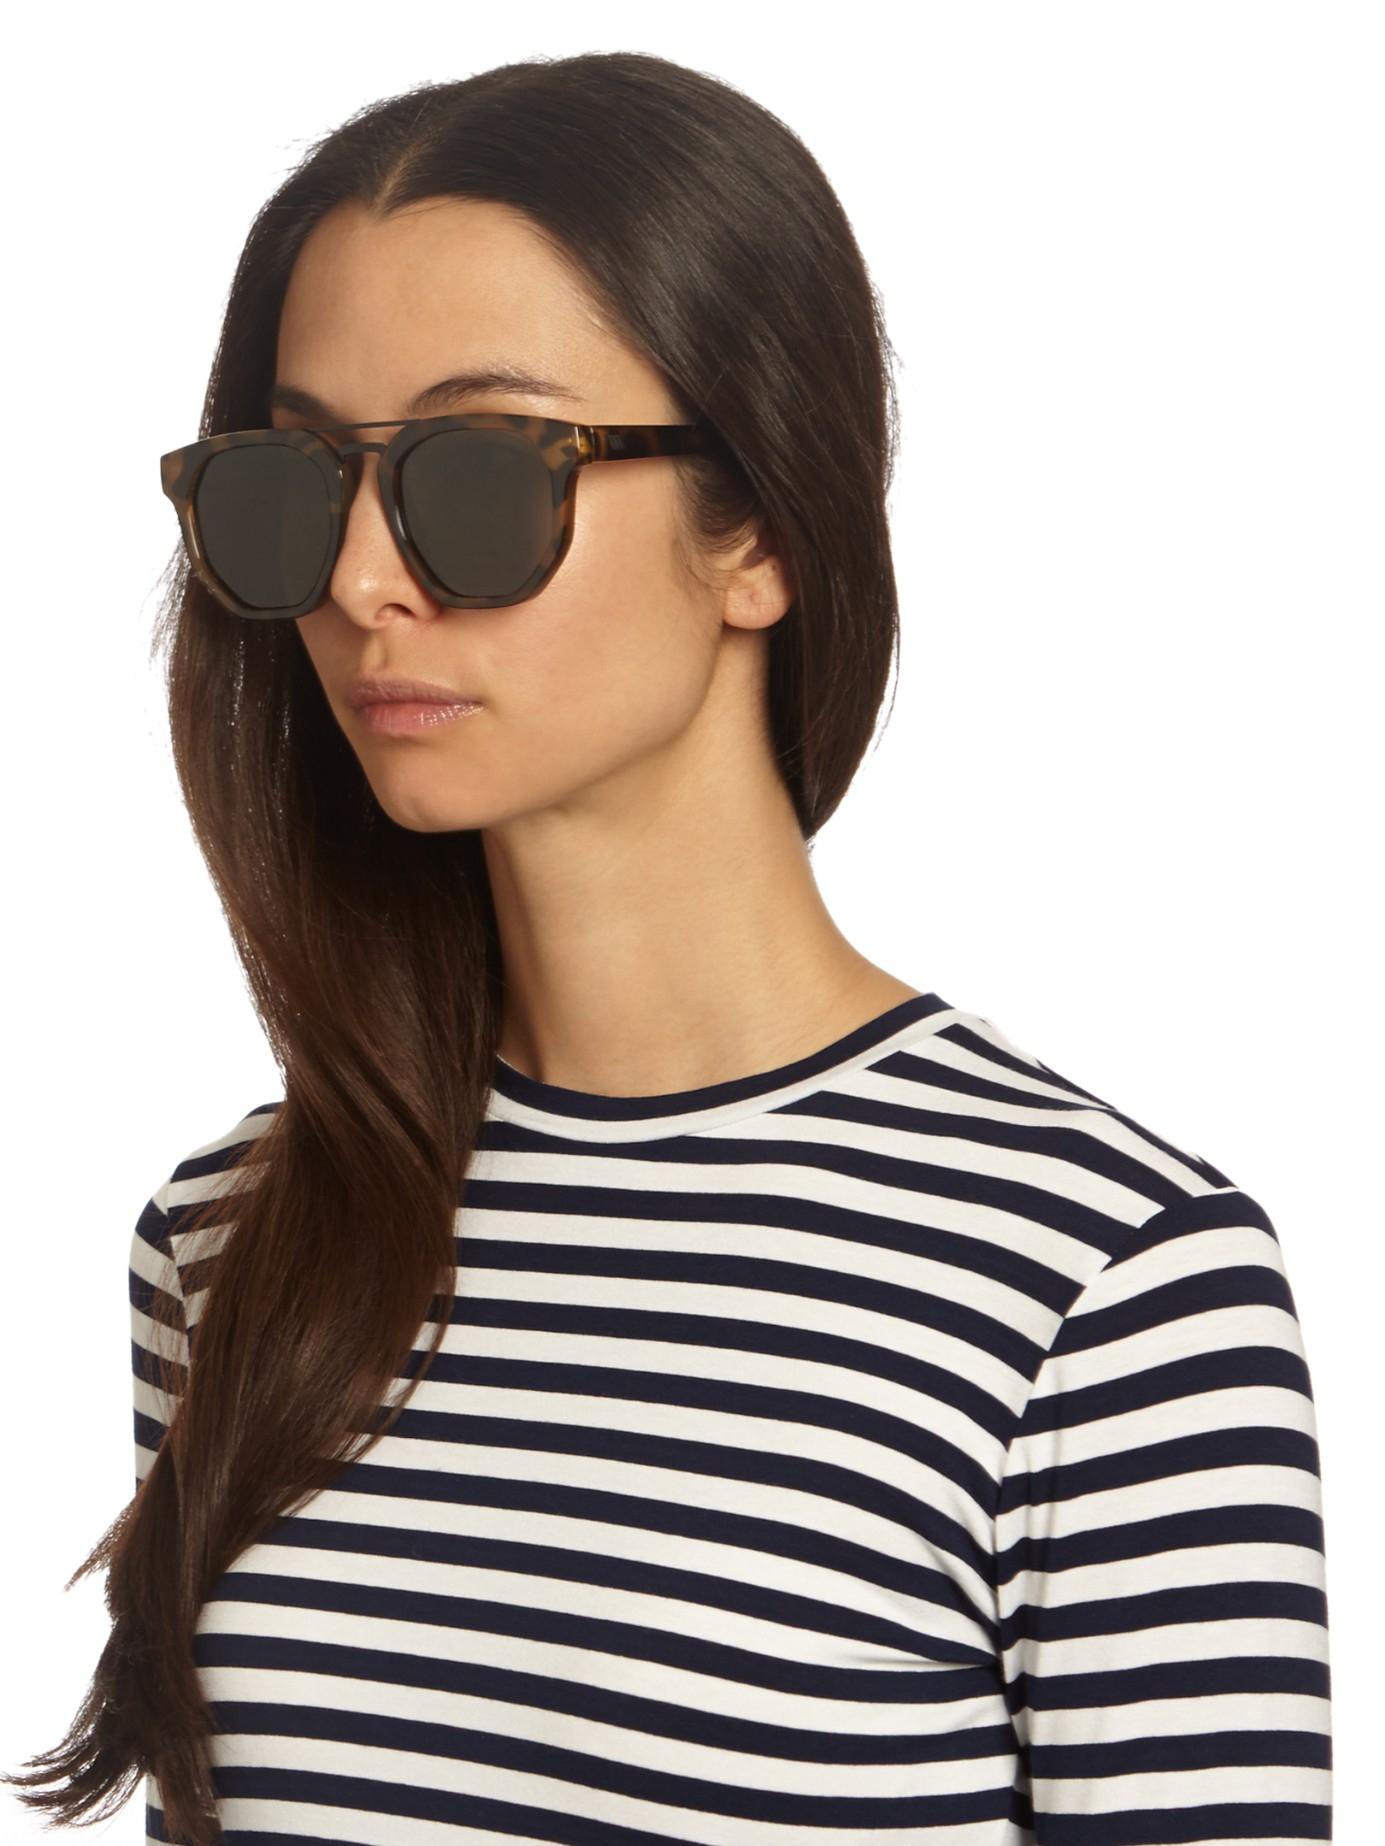 0878120c7f Lyst - Le Specs Thunderdome Sunglasses in Black